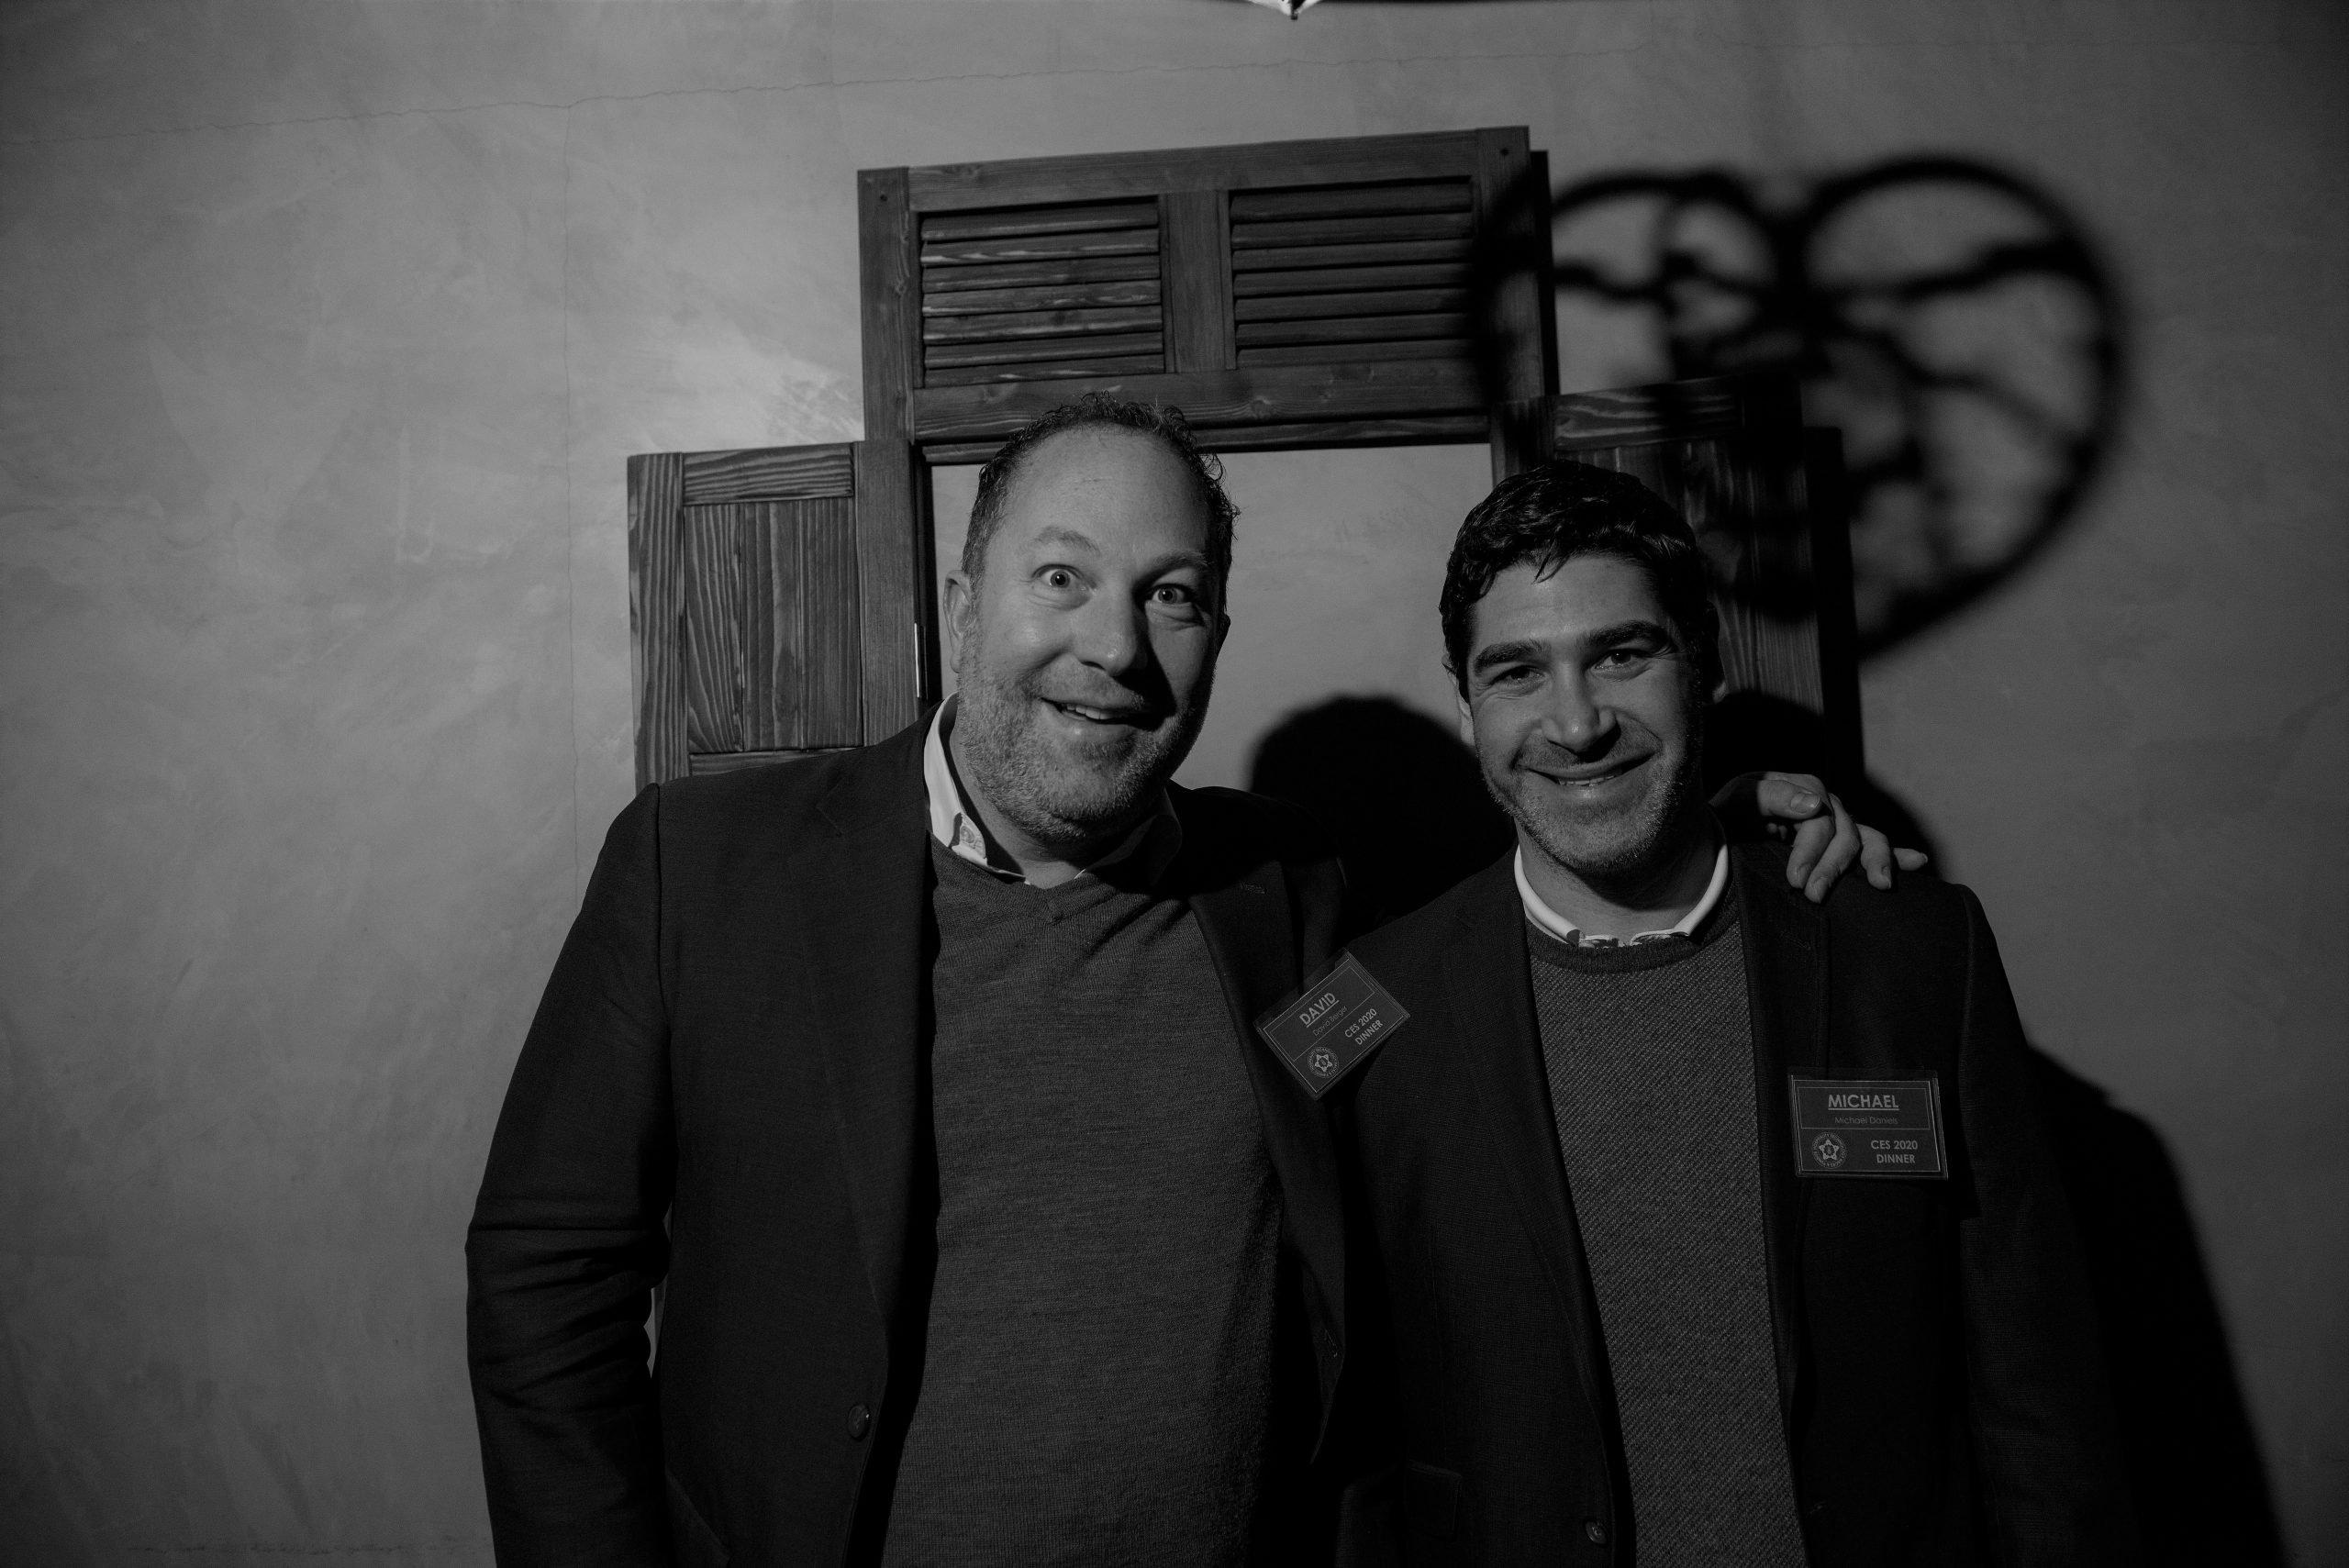 David Berger & Michael Daniels from Volara at Hospitality Technology Hacks & Pundits